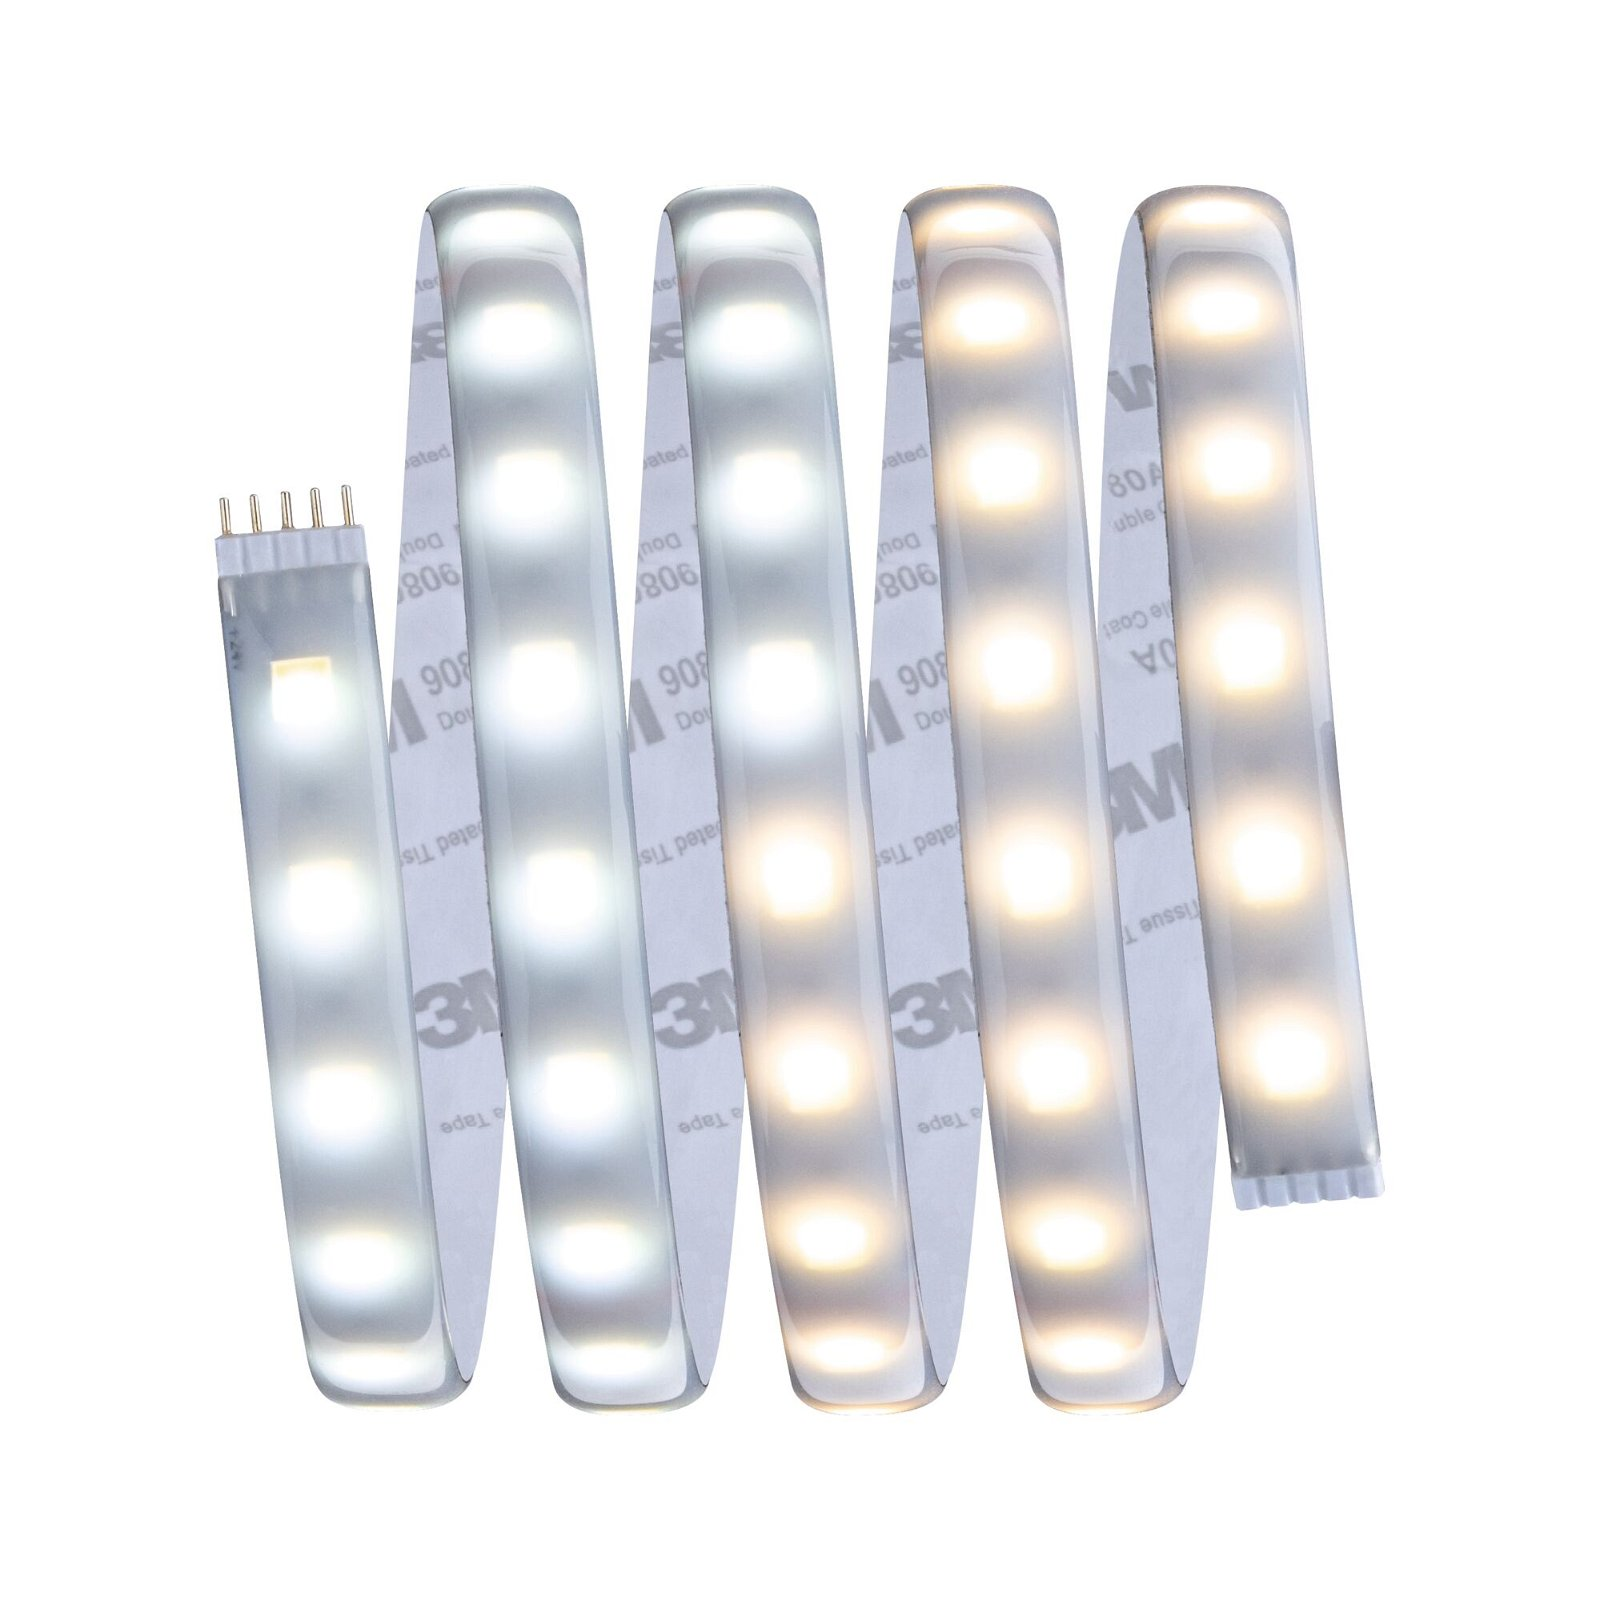 MaxLED 500 Strip LED Tunable White 1,5m recouvert 10W 825lm Tunable White 20VA